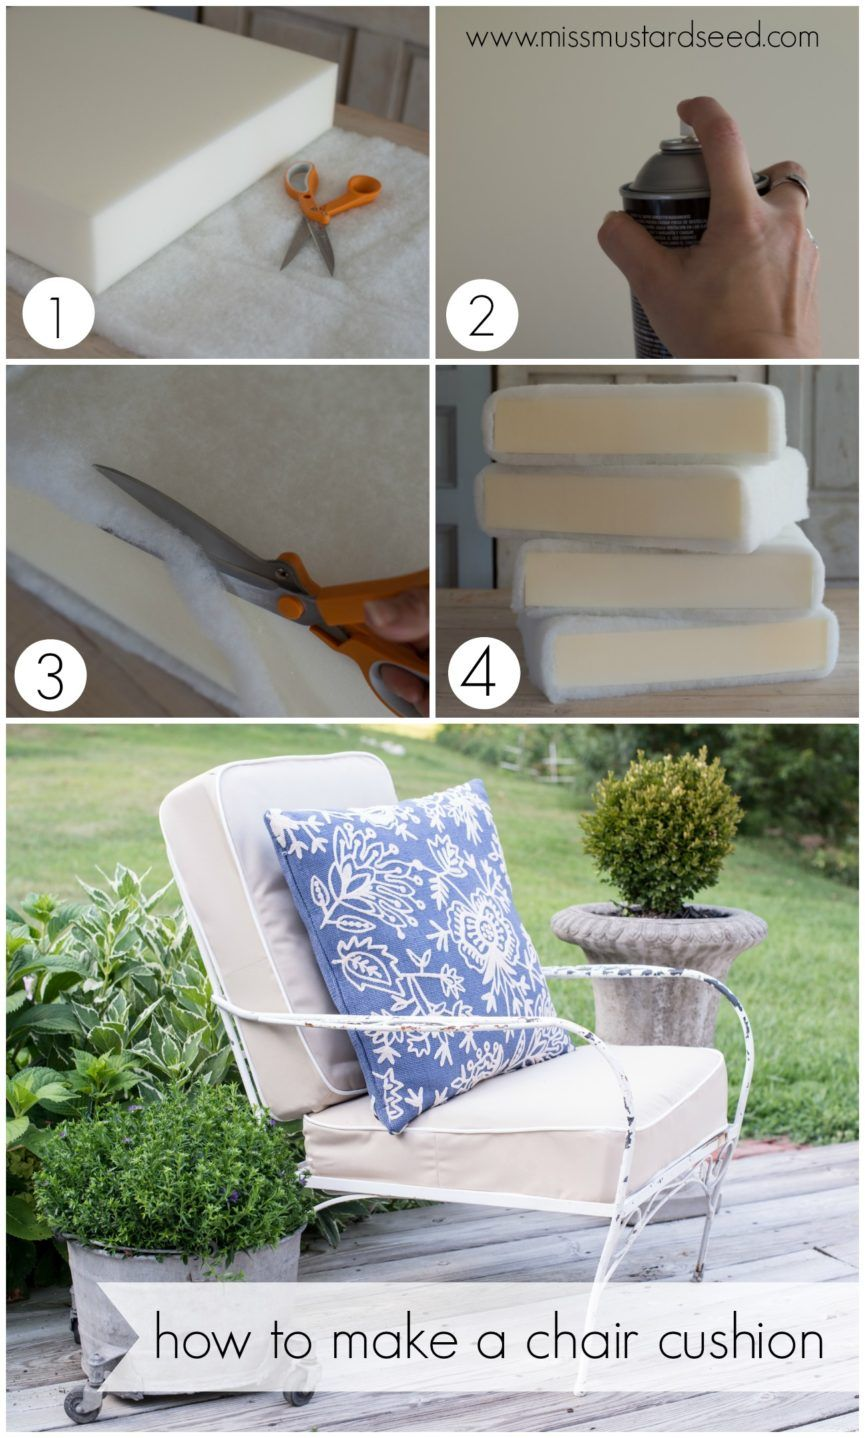 How To Make A Chair Cushion Deck Chair Makeover In 2020 Diy Outdoor Cushions Diy Patio Cushions Outdoor Patio Chair Cushions